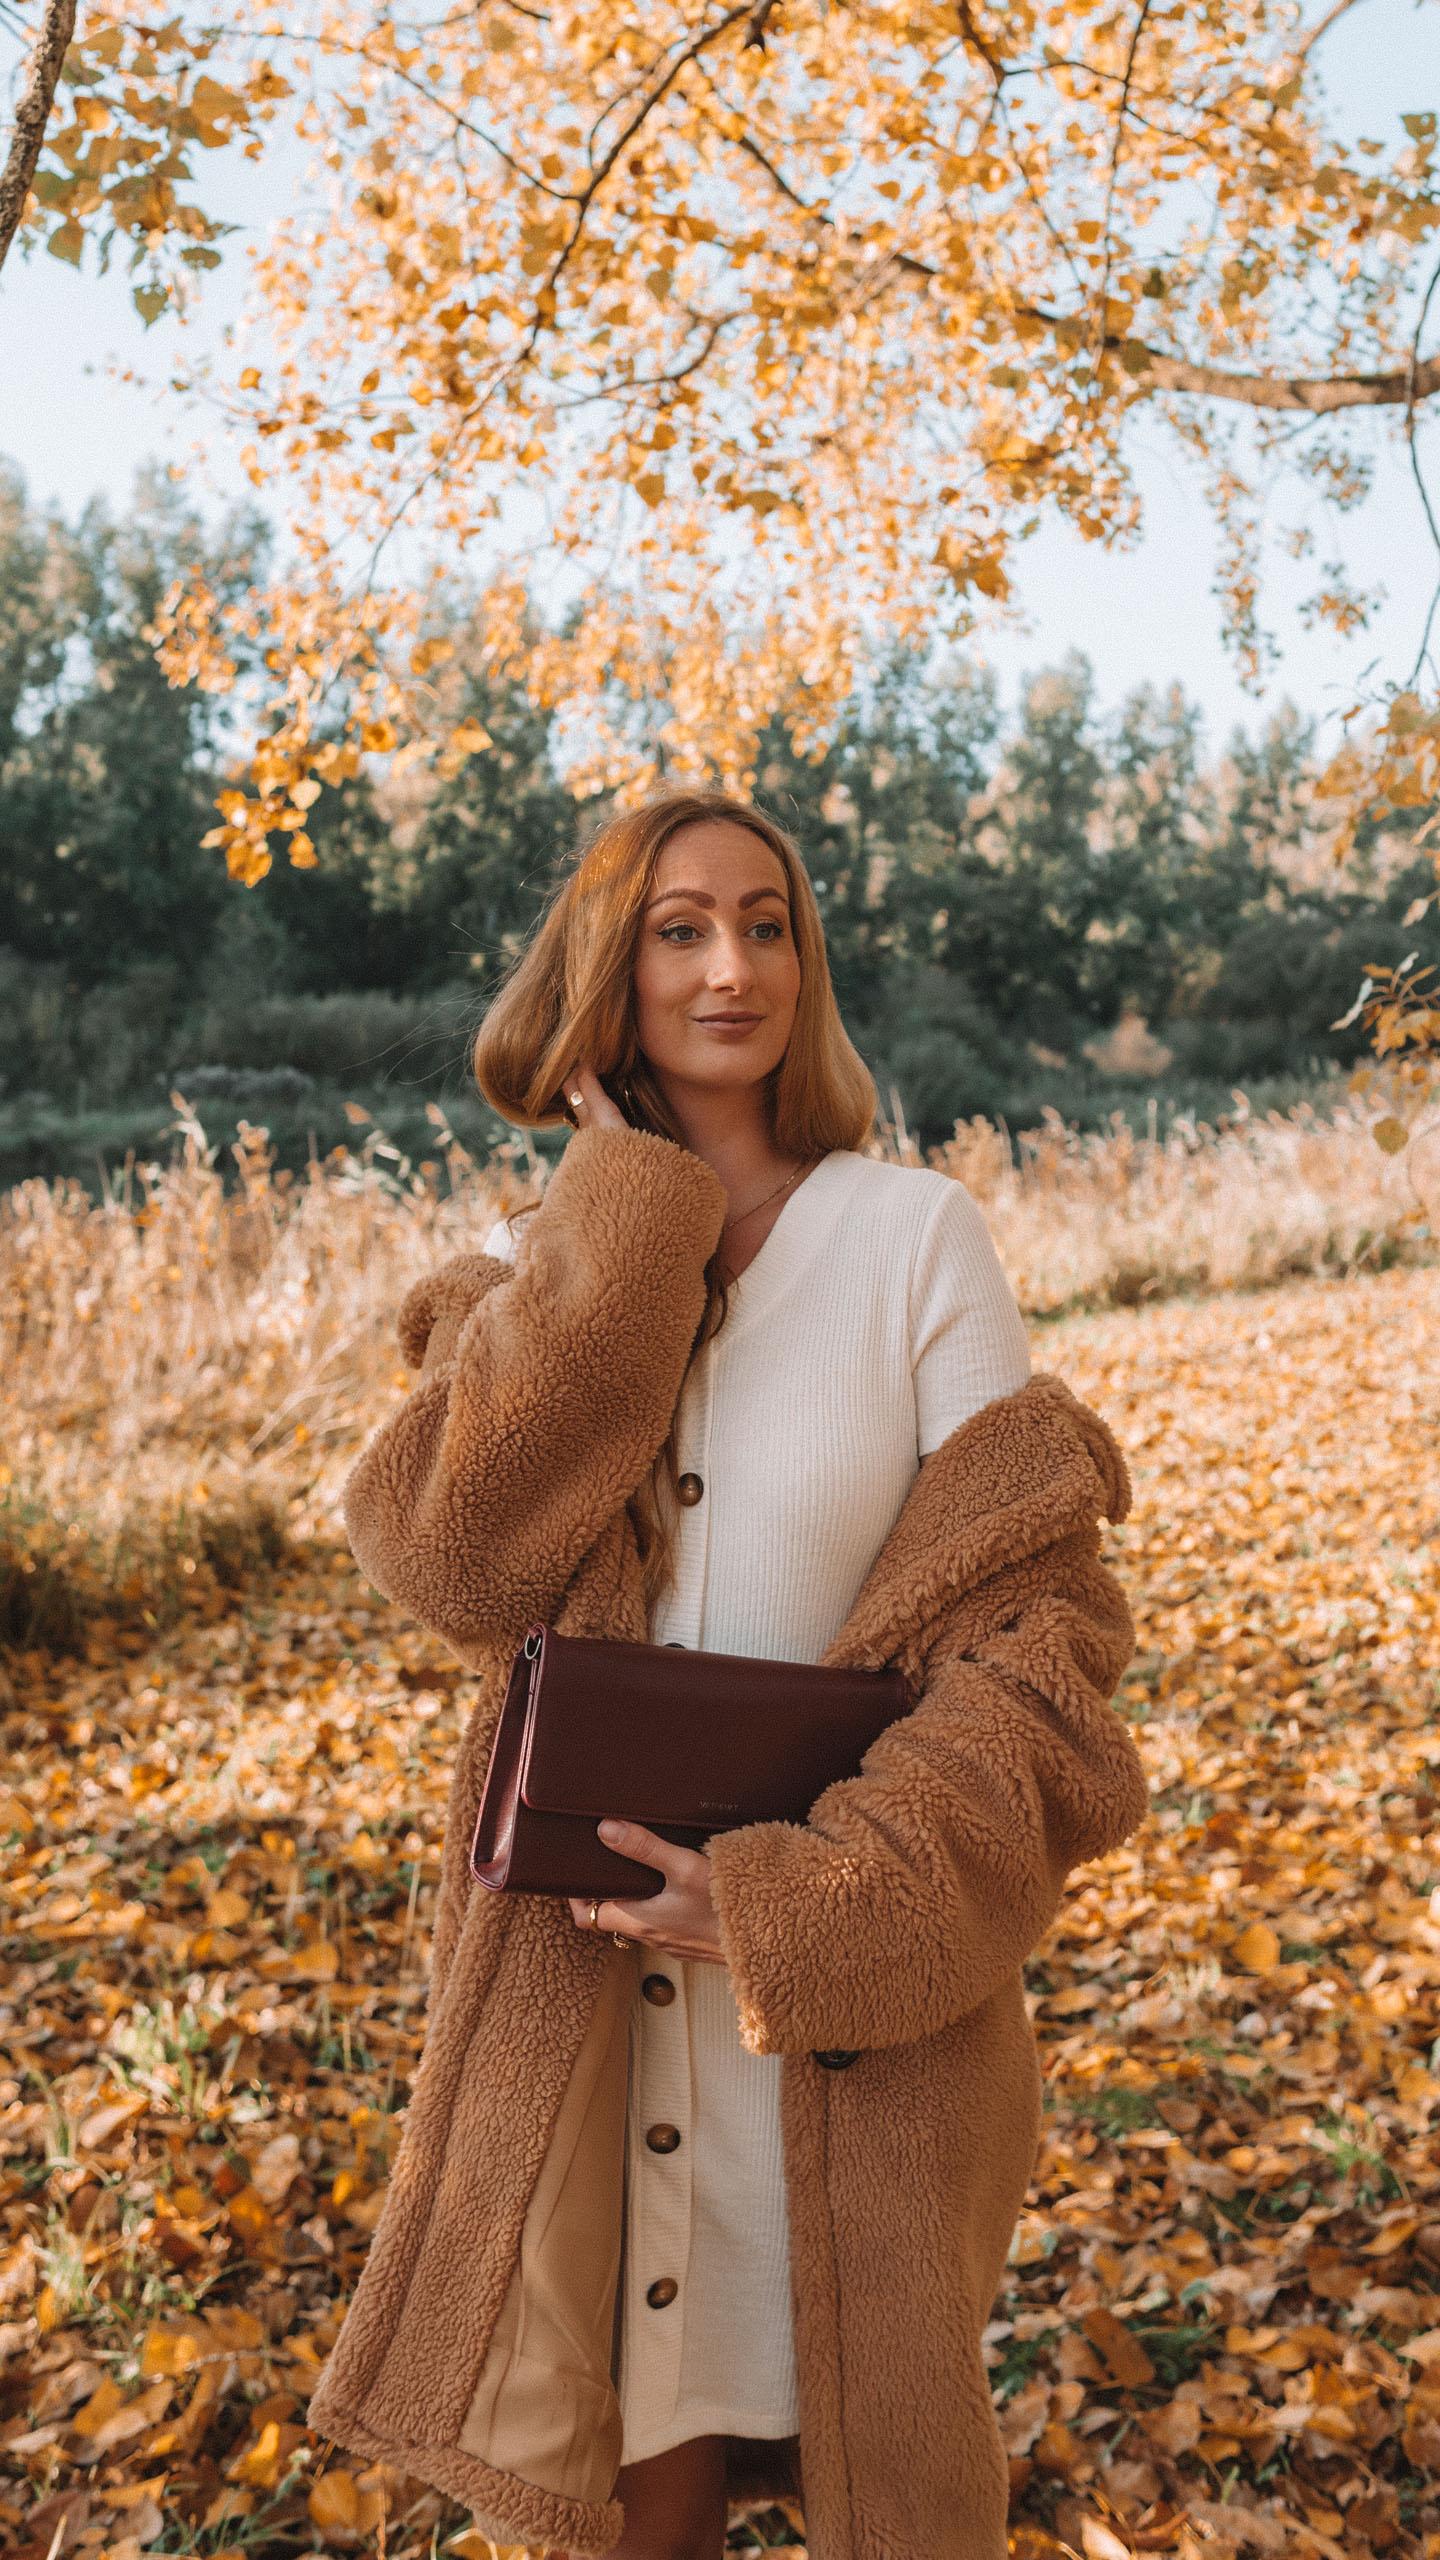 Fur Free Fur Linda's Wholesome Life